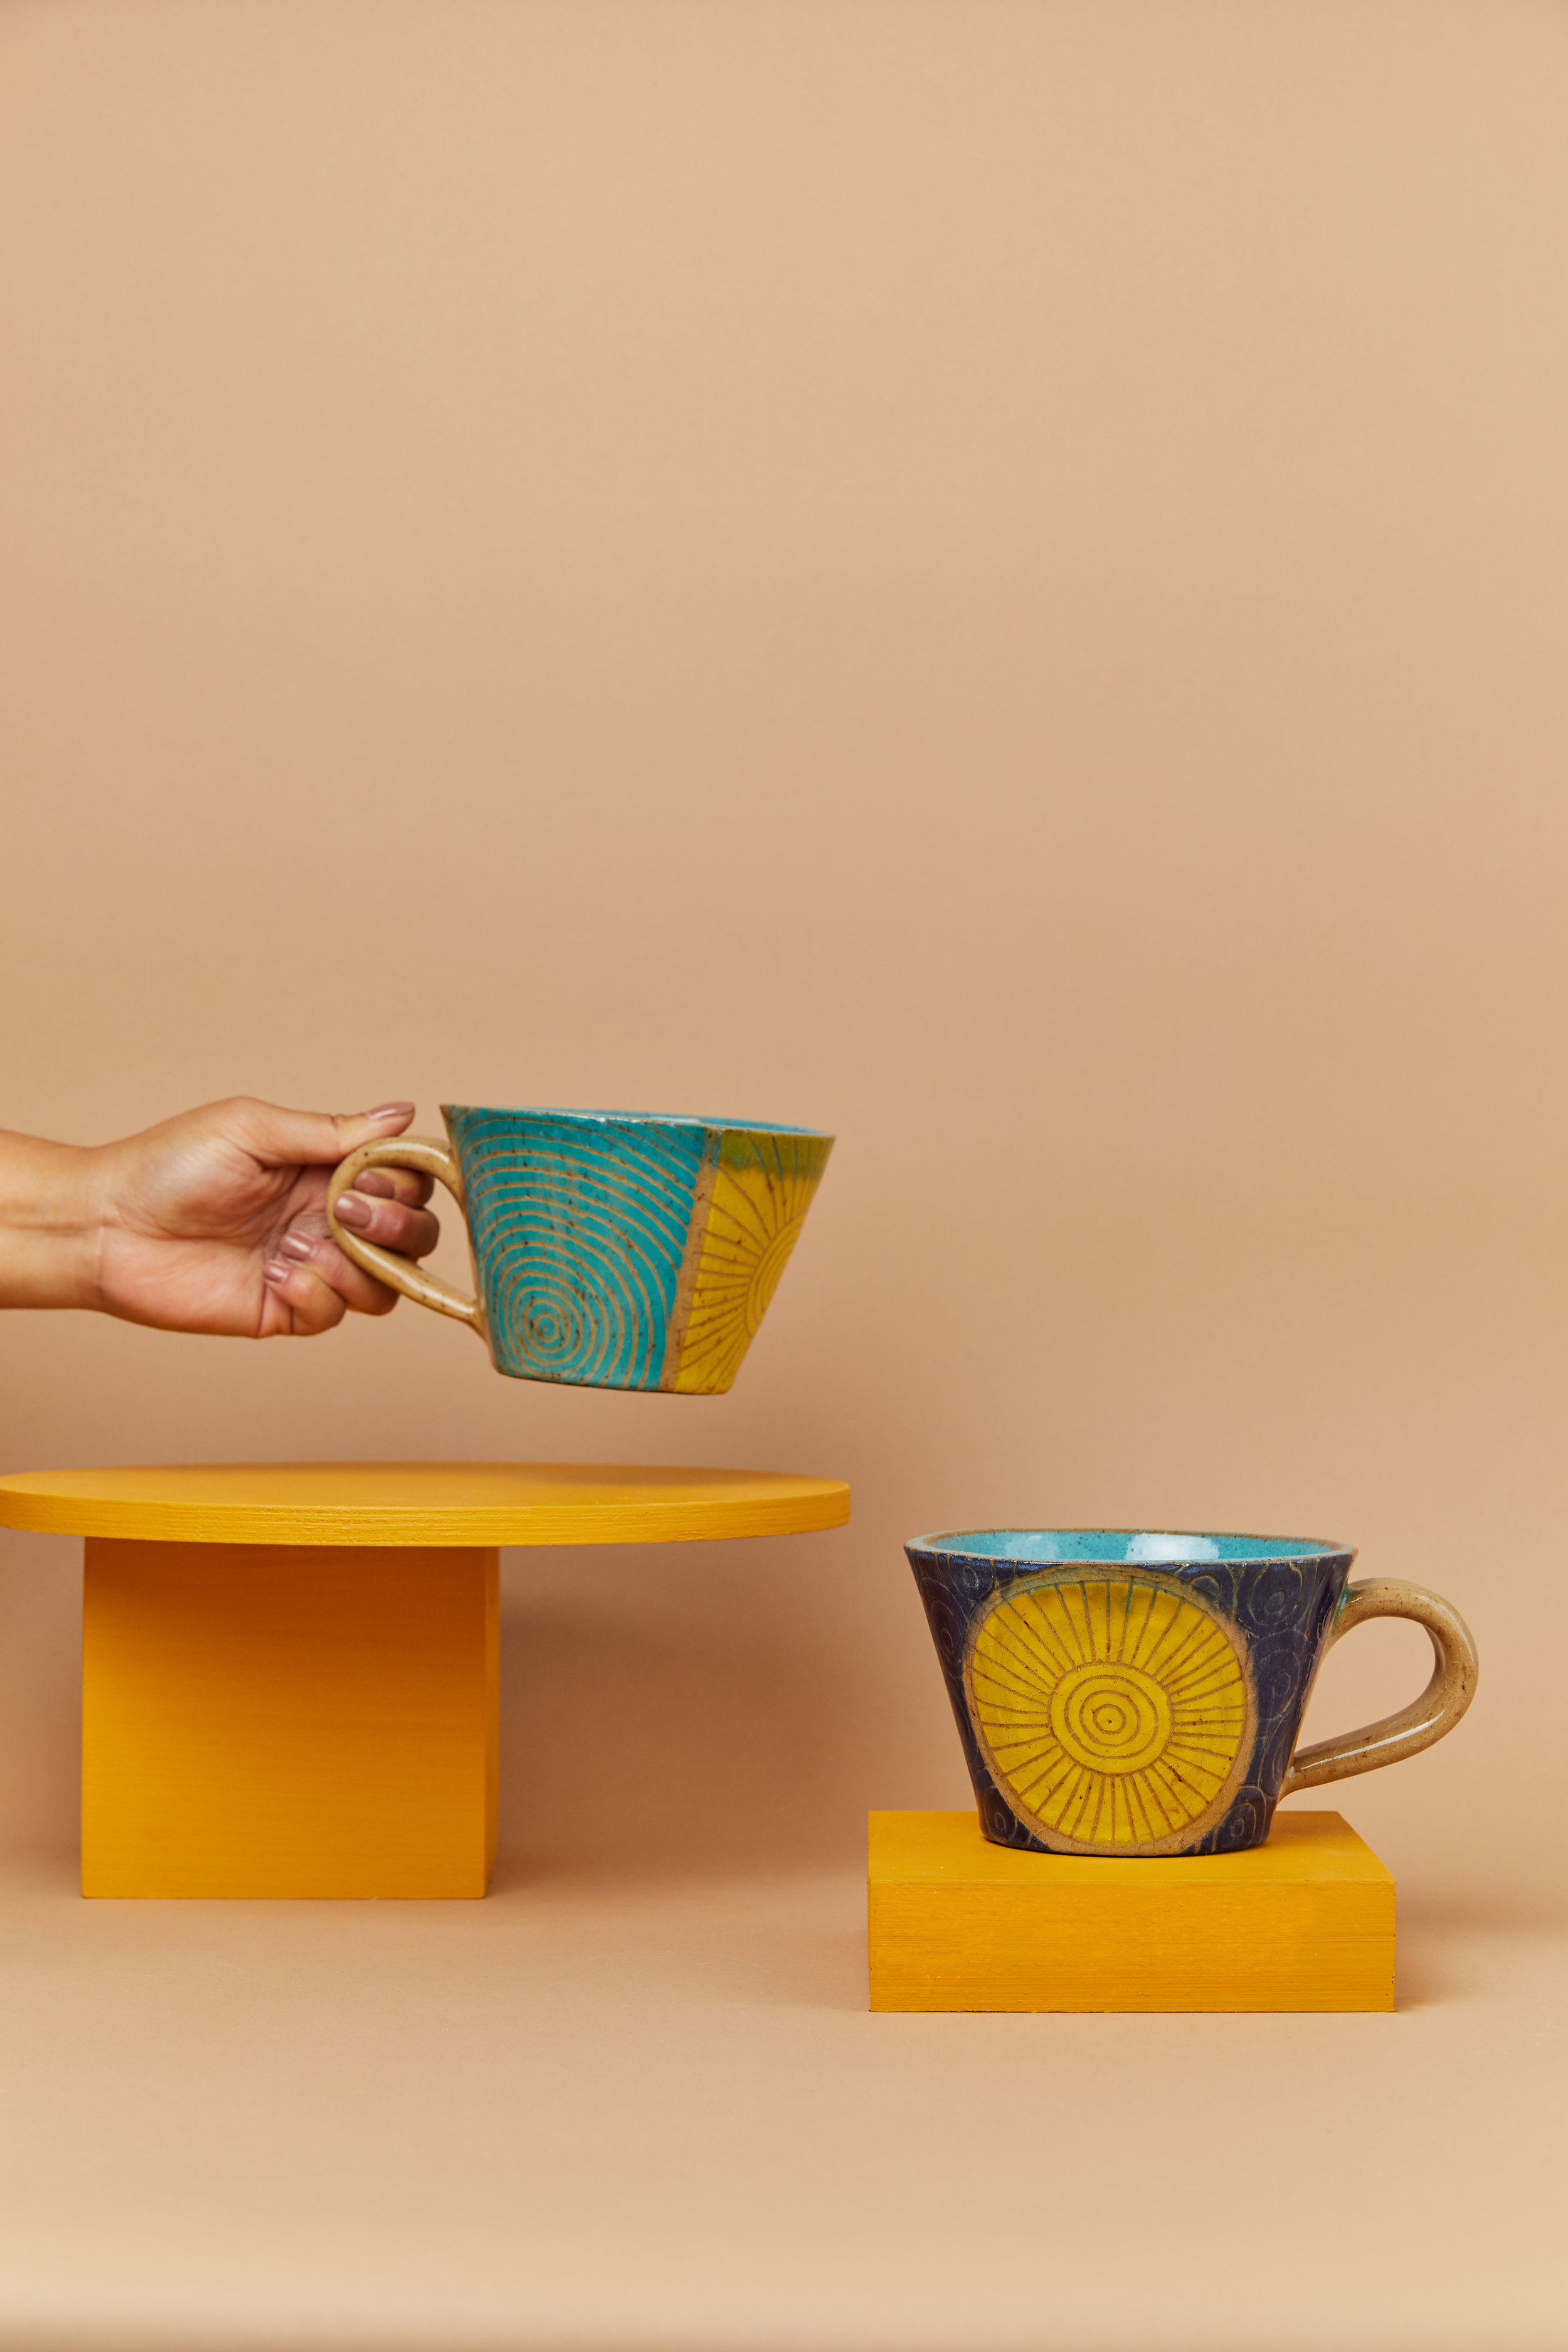 Blue soup mugs by Threet Ceramics.